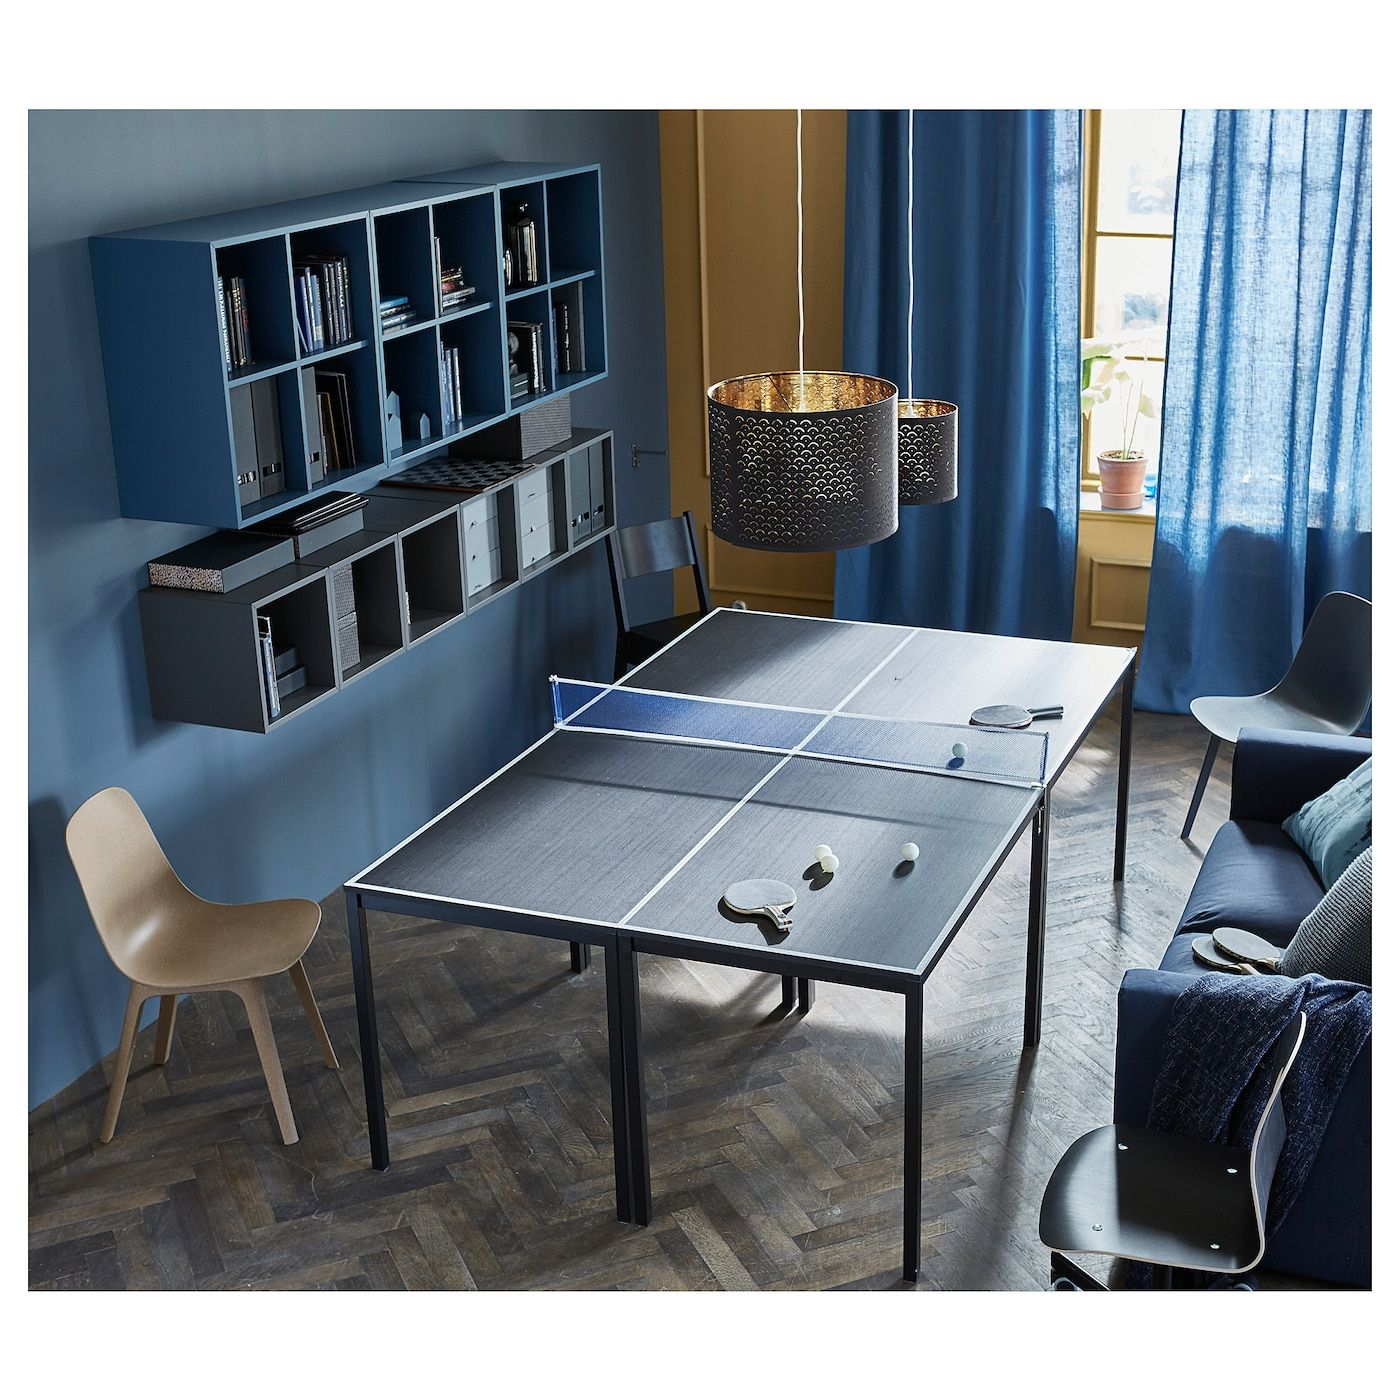 Tarendo Table Black Ikea Dining Room Design Table Tennis